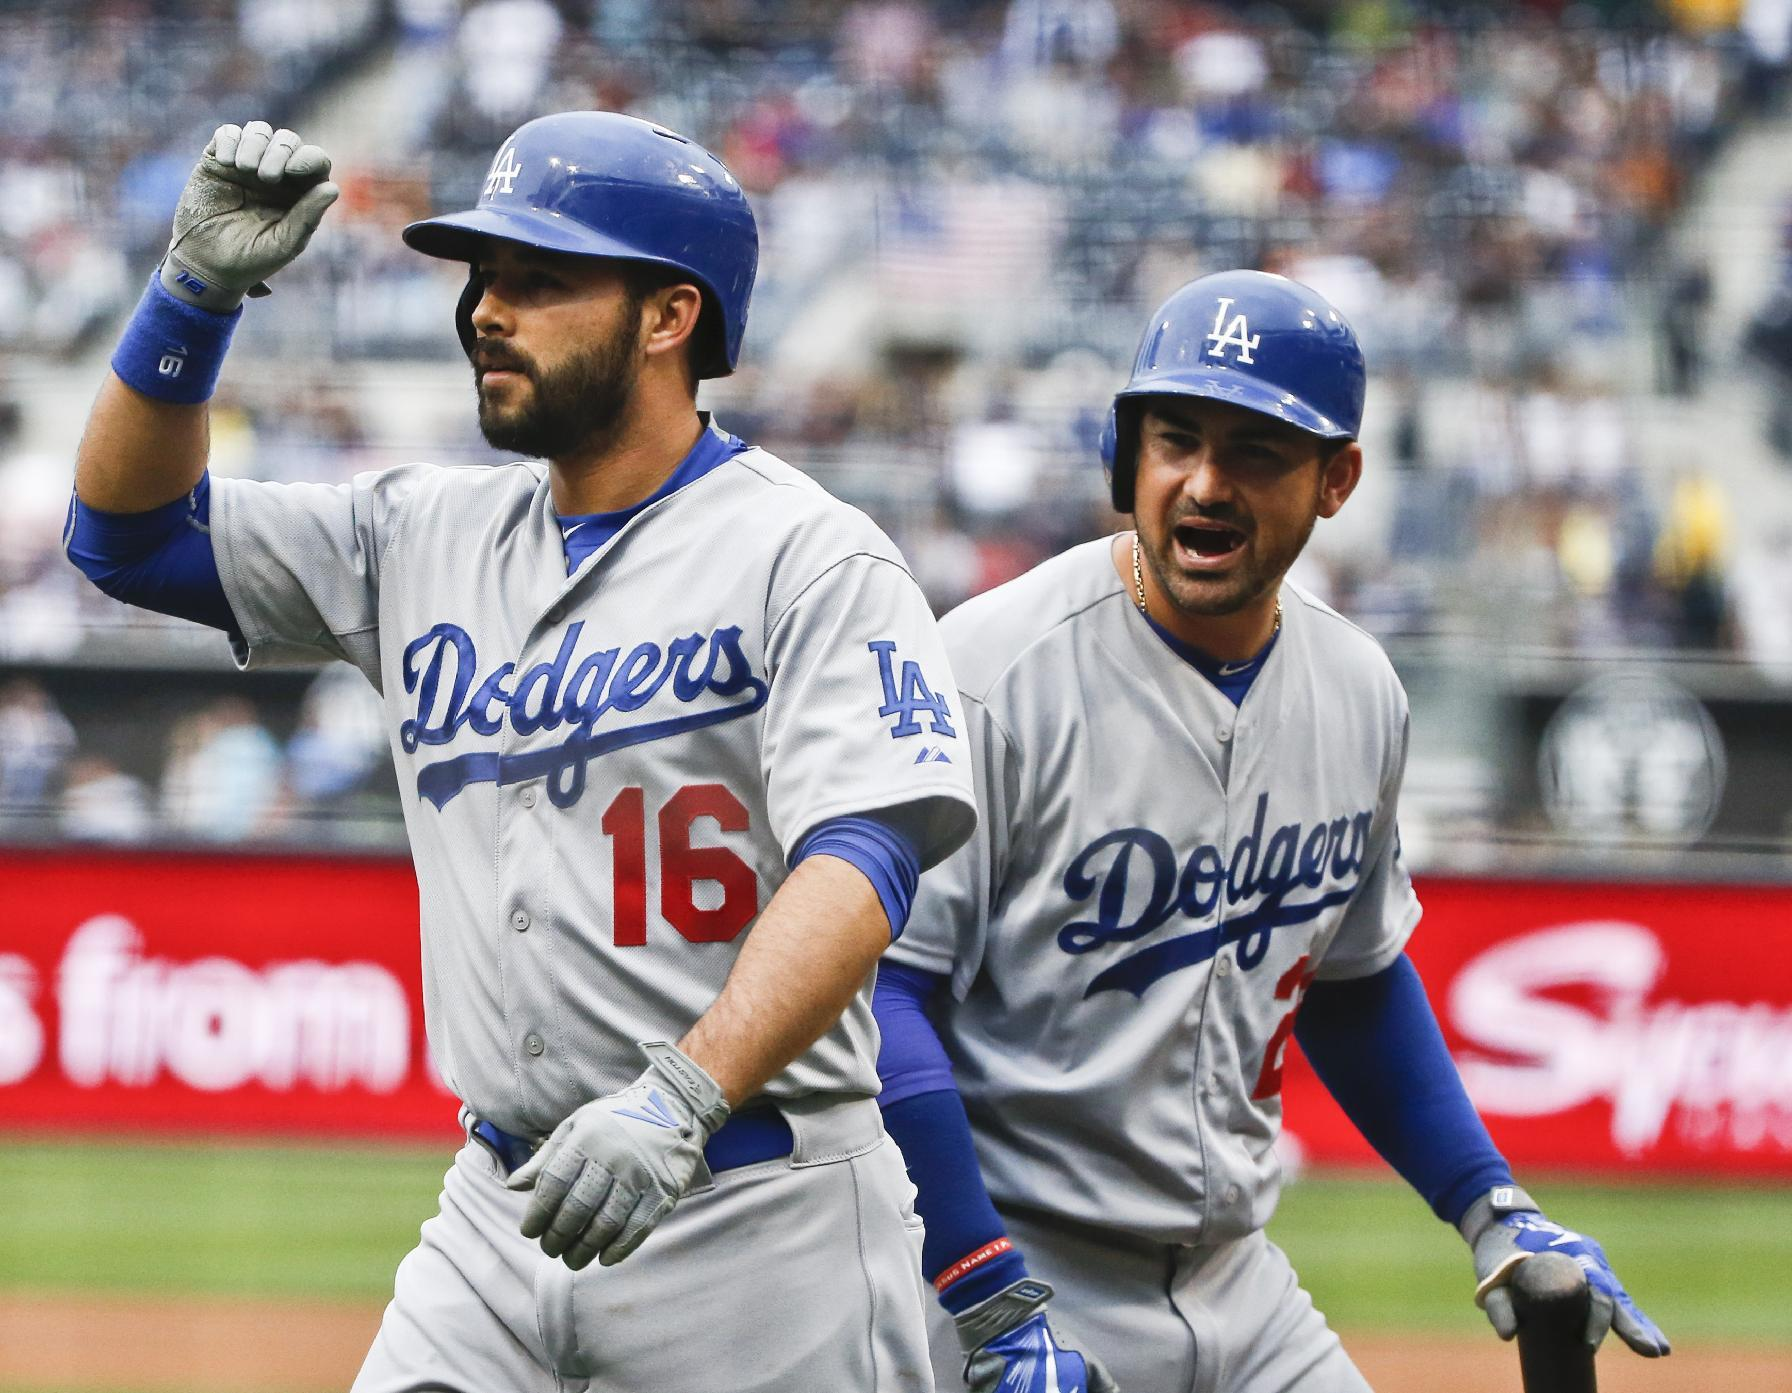 Gonzalez's 3-run homer leads Dodgers to 11-8 win over Padres